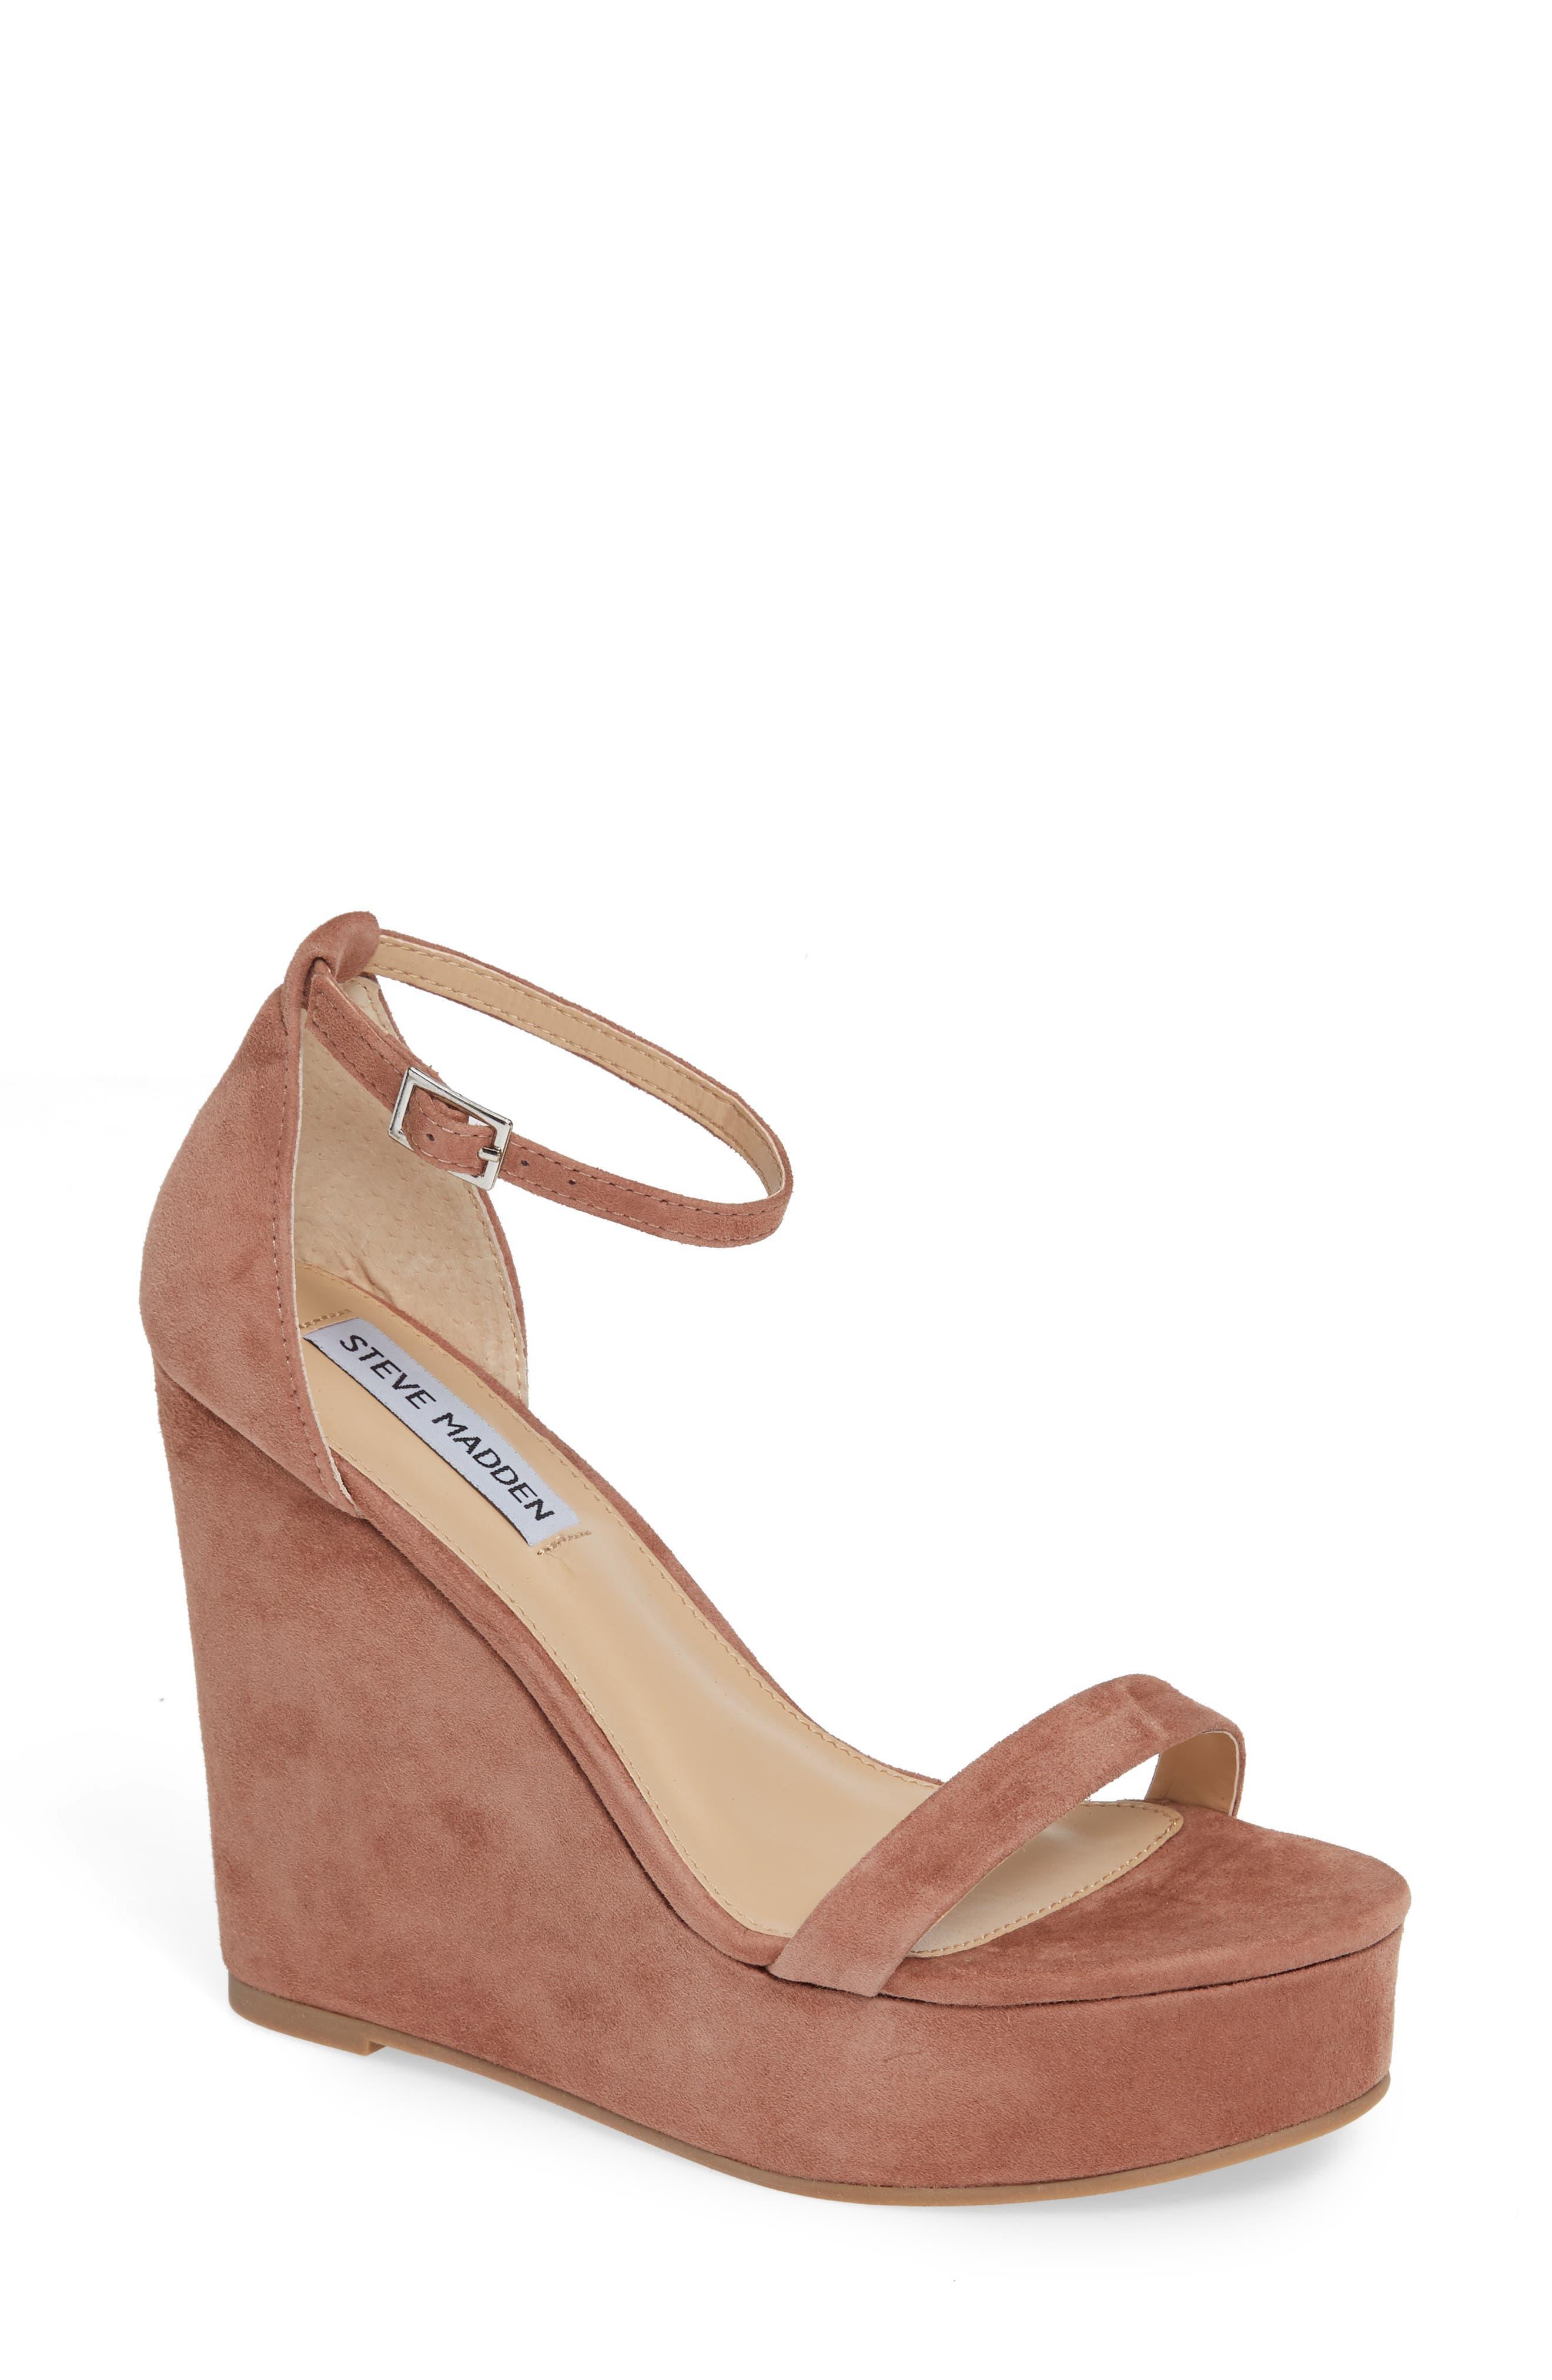 Succeed Platform Wedge Sandal,                         Main,                         color, TAN SUEDE